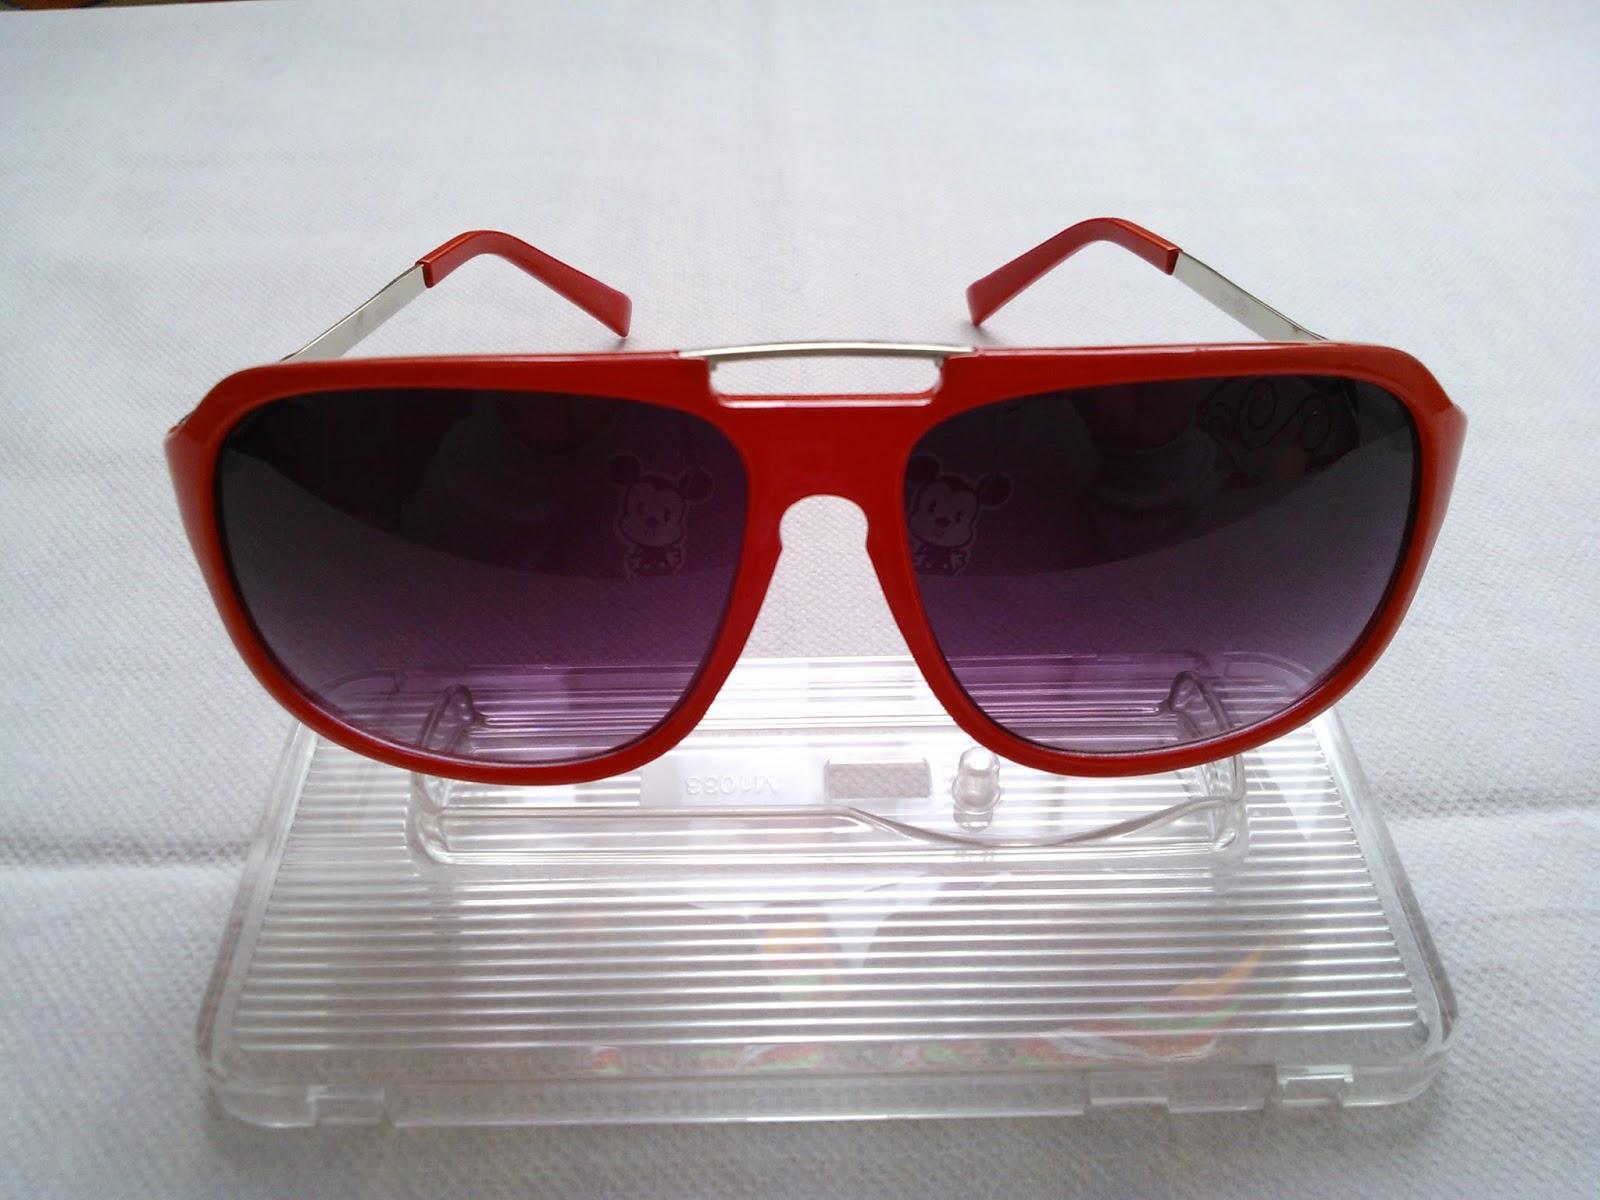 dfa88c3cb0 LINK PARA COMPRAR POR MERCADO LIBRE MÉXICO http://articulo.mercadolibre .com.mx/MLM-541764480-paquete-de-lentes -para-disfraces-para-fiesta-tipo-retro-_JM